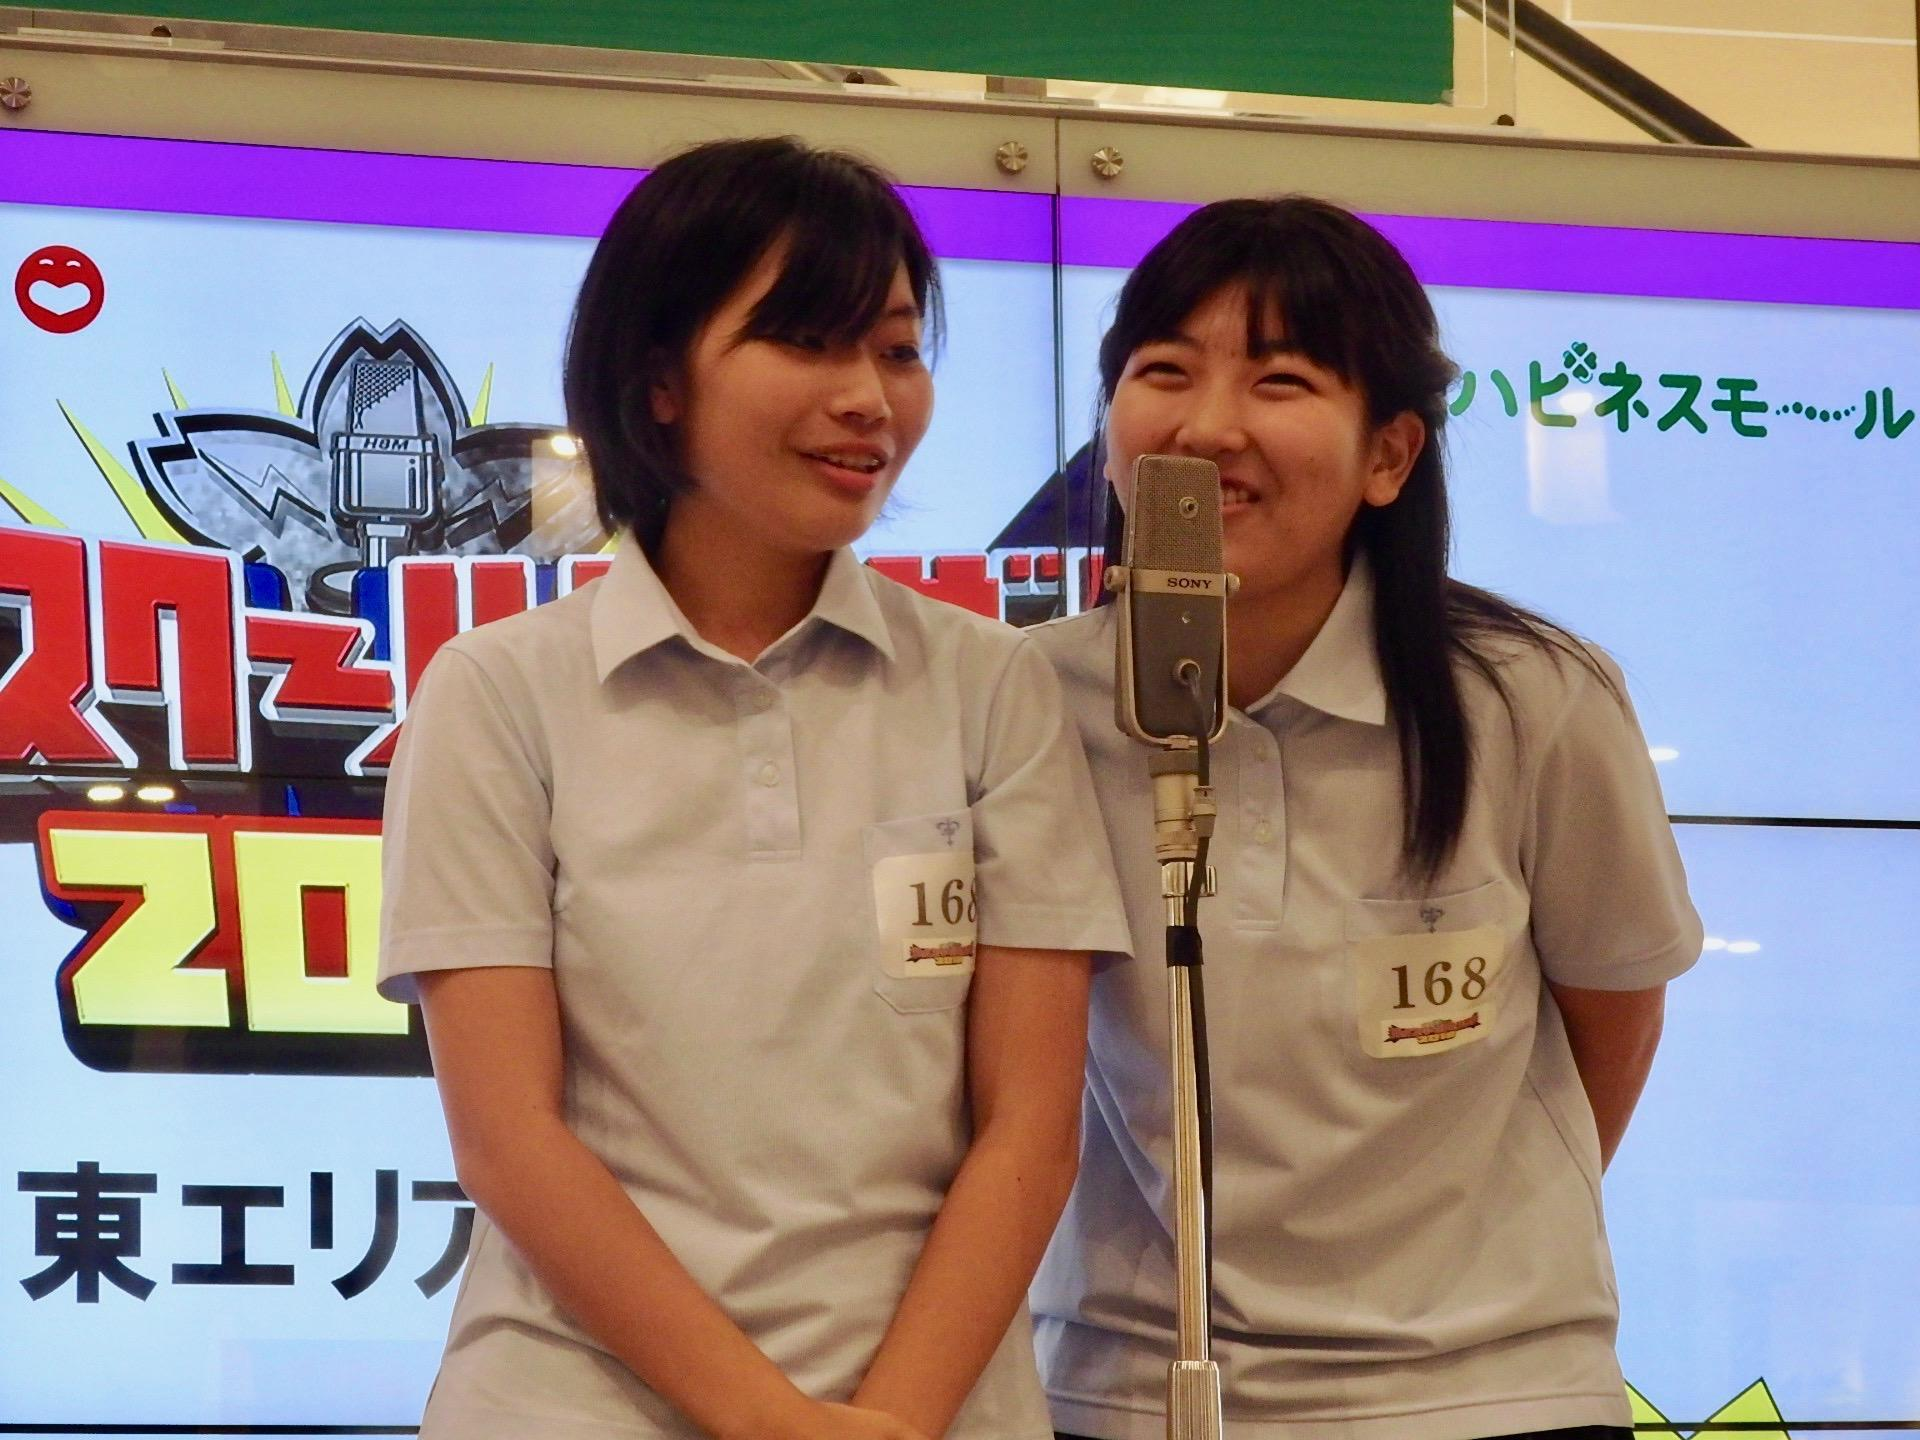 http://news.yoshimoto.co.jp/20180901154230-881910703e2615c53c7ab03a976189dbc410fbc6.jpg